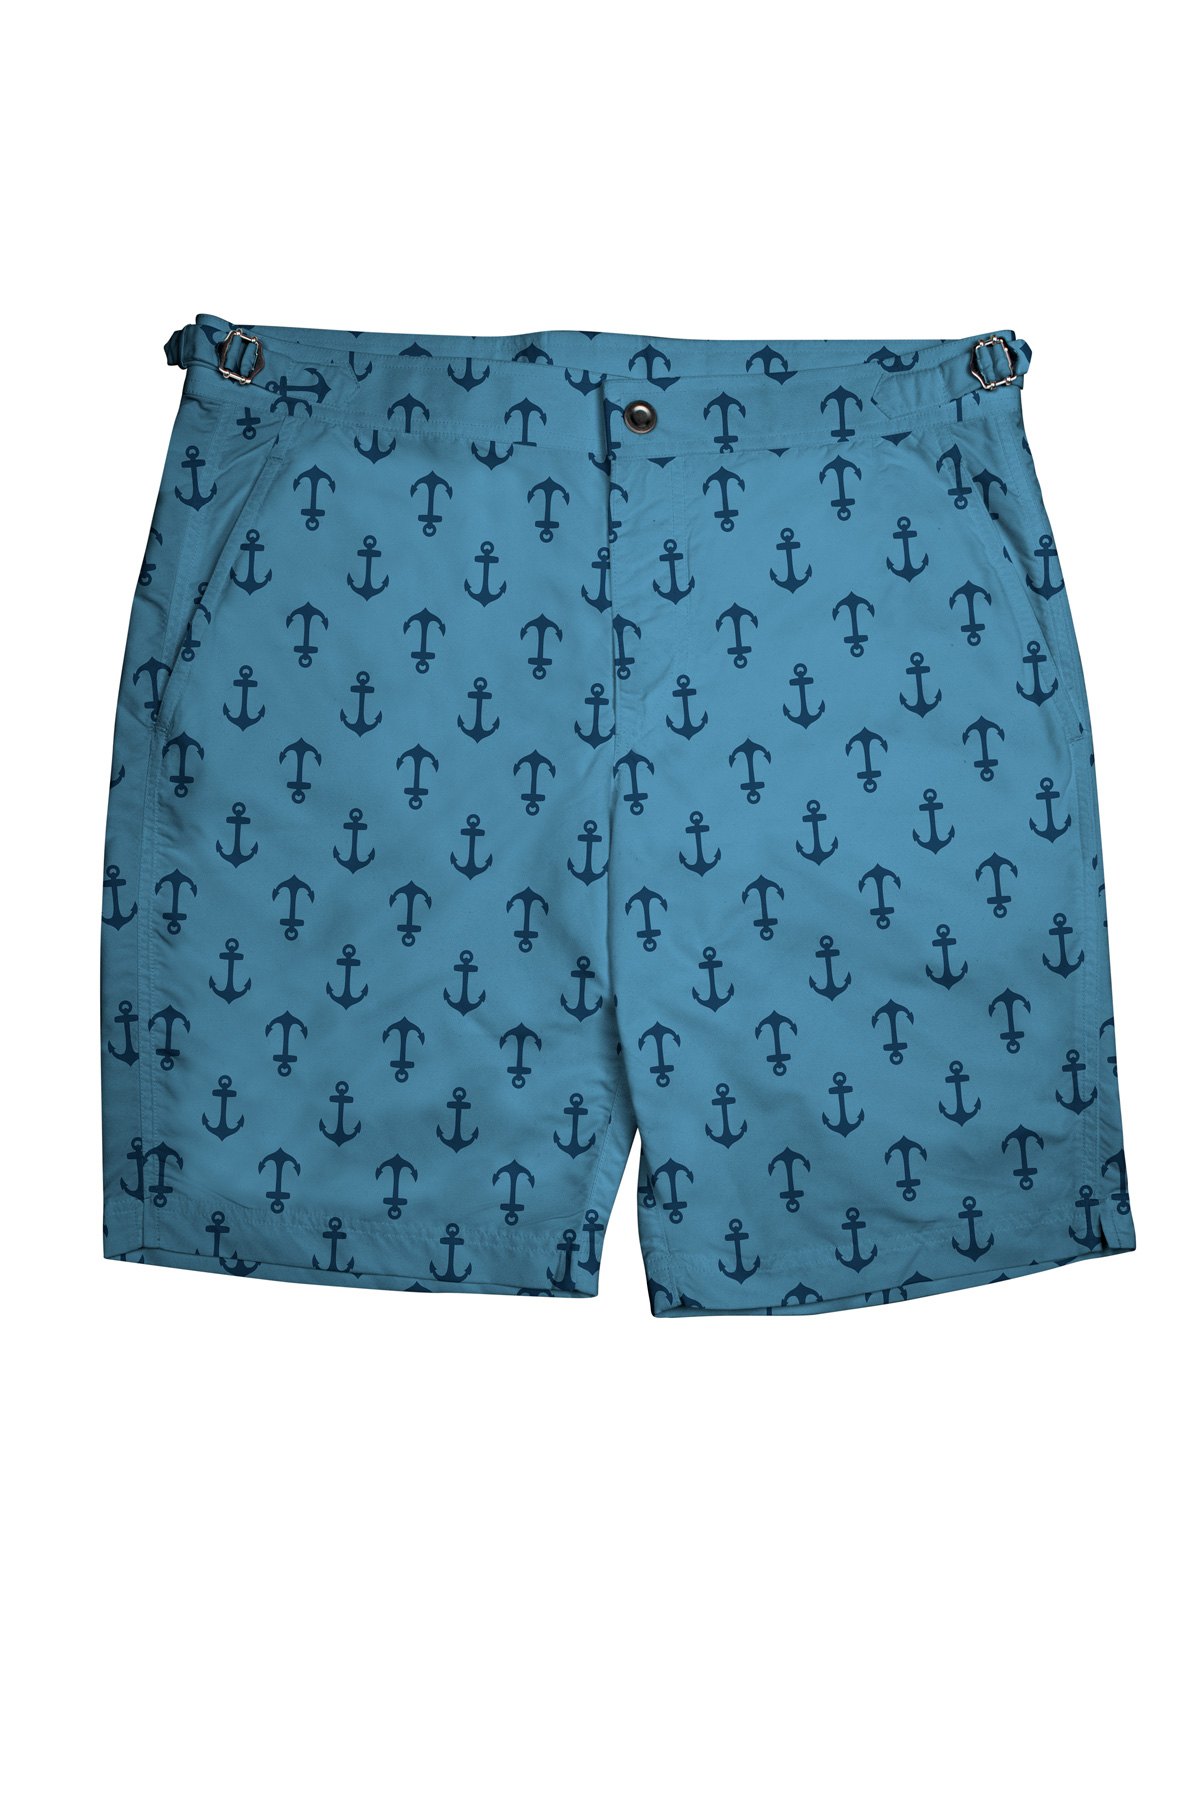 Blue/Navy Anchors Swim Shorts